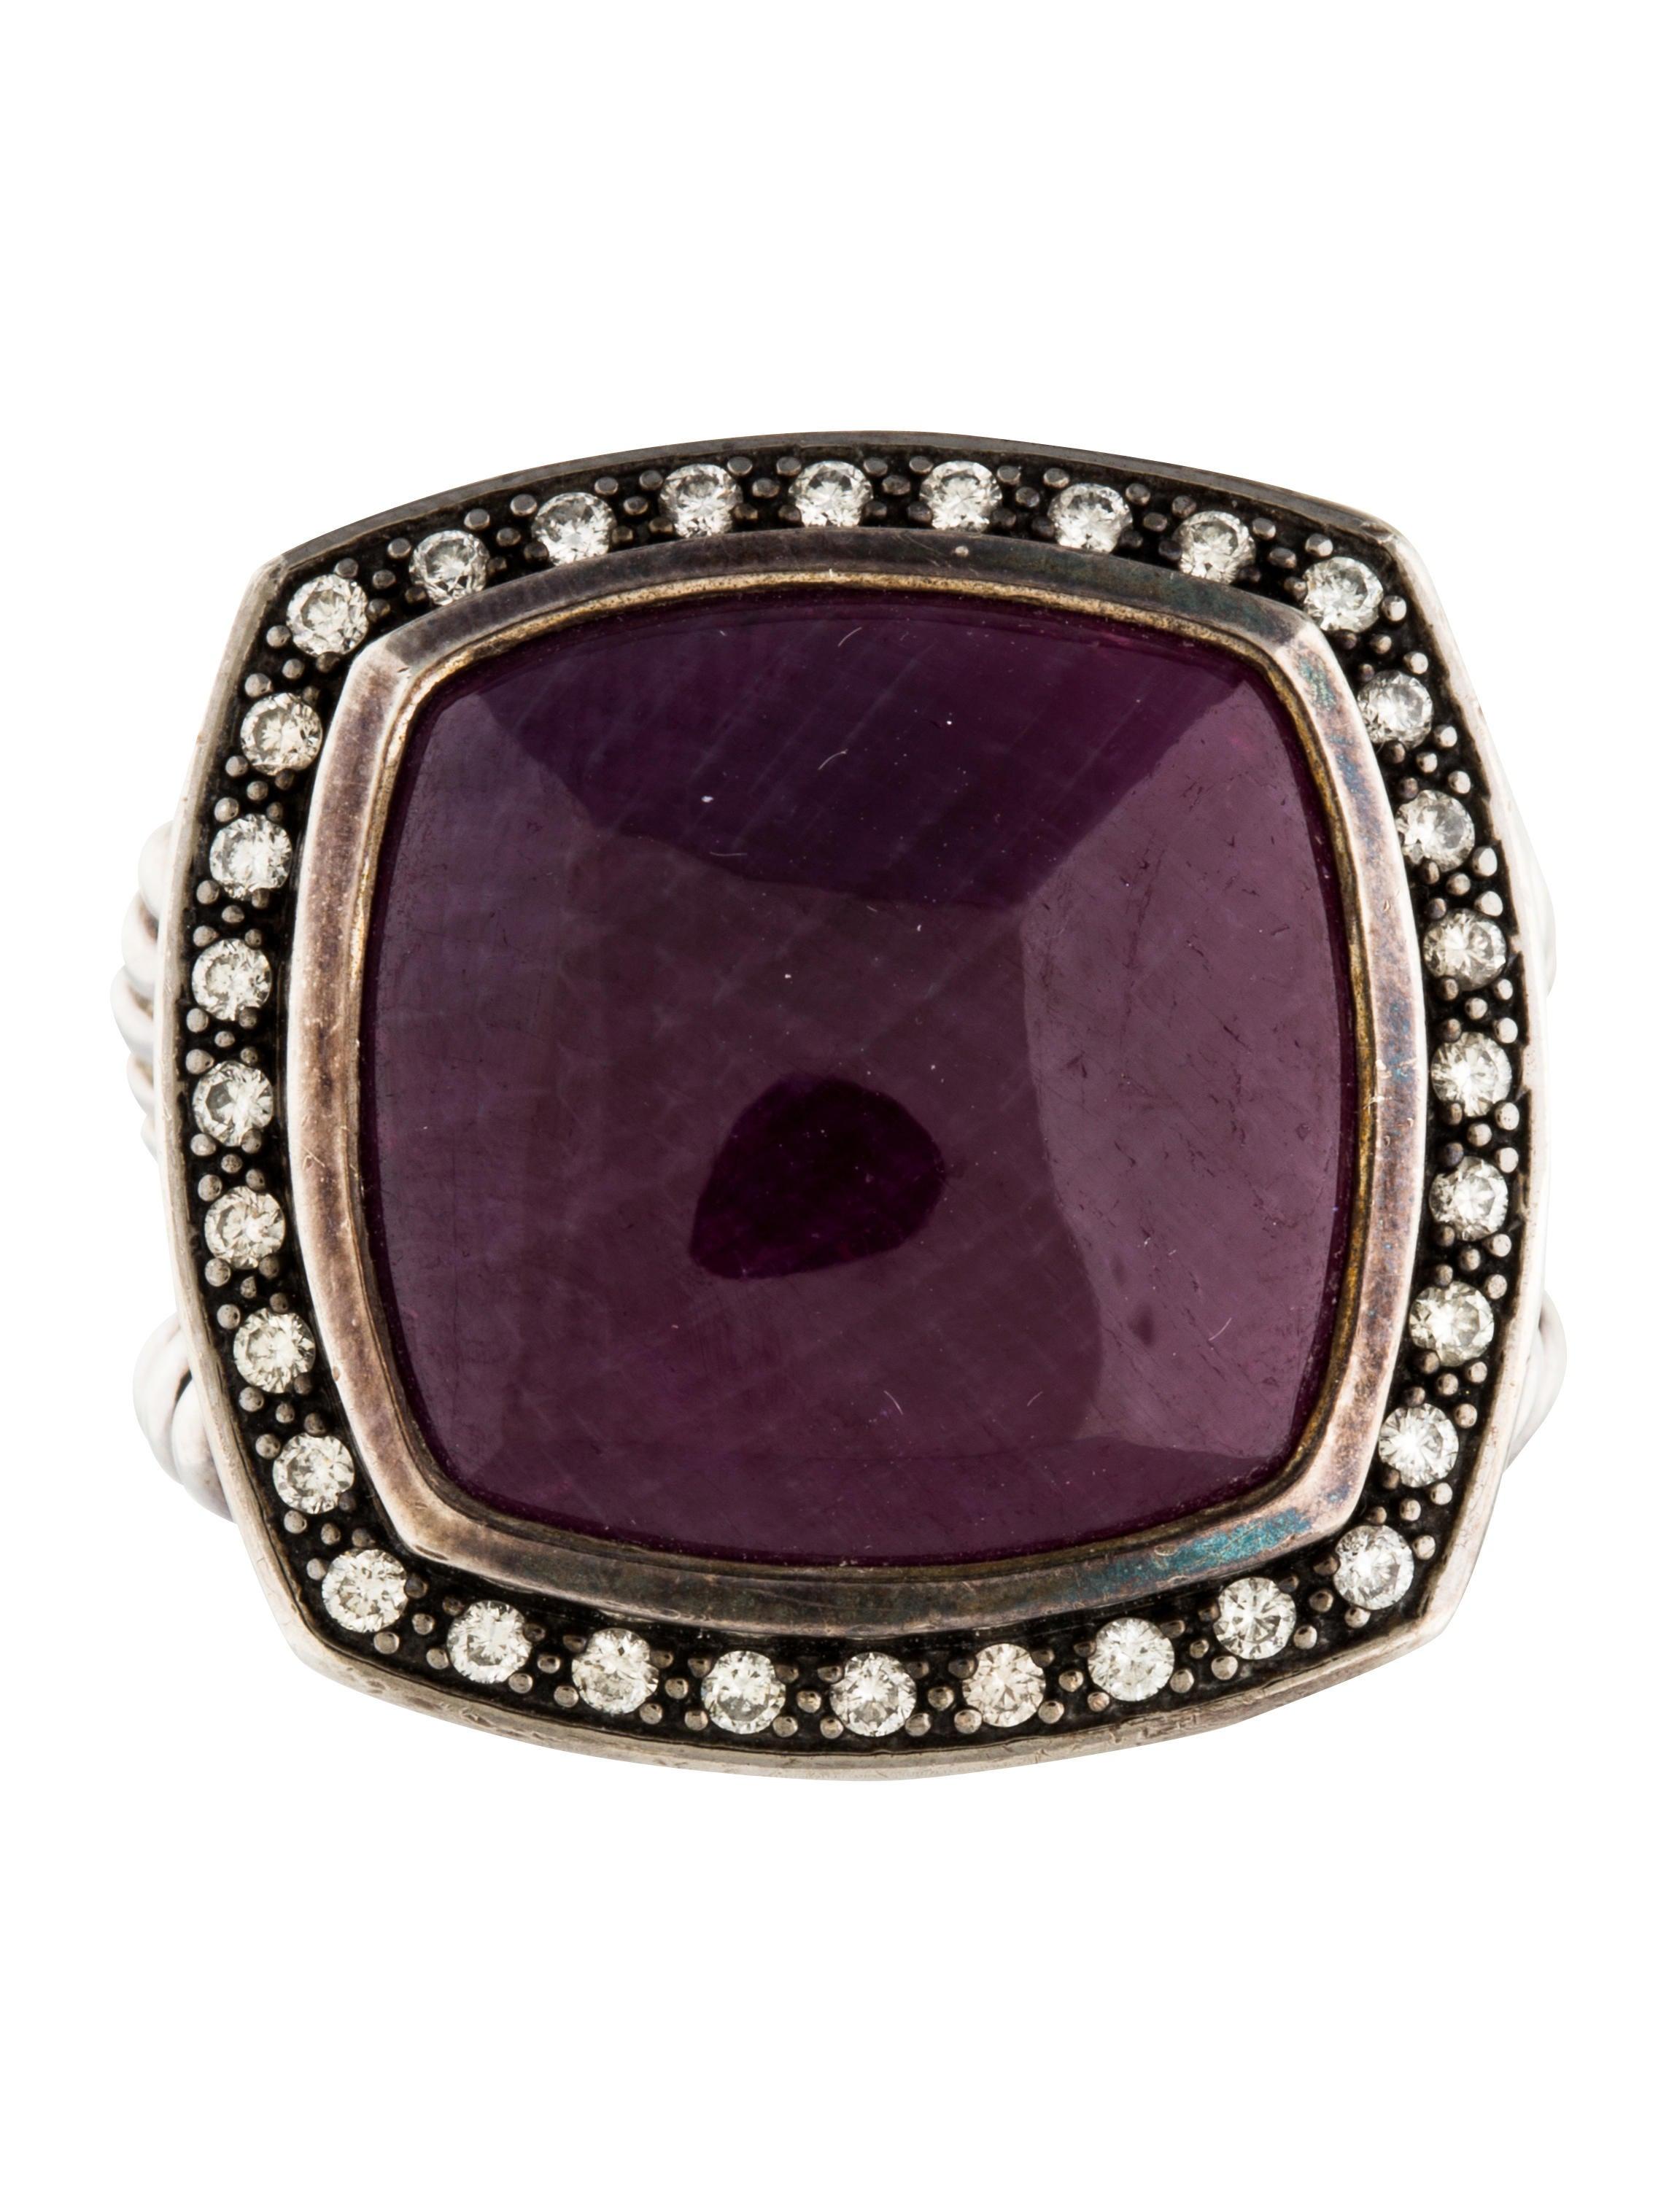 David Yurman Ruby amp Diamond Albion Ring Rings DVY39270  : DVY392703enlarged from www.therealreal.com size 2299 x 3033 jpeg 433kB